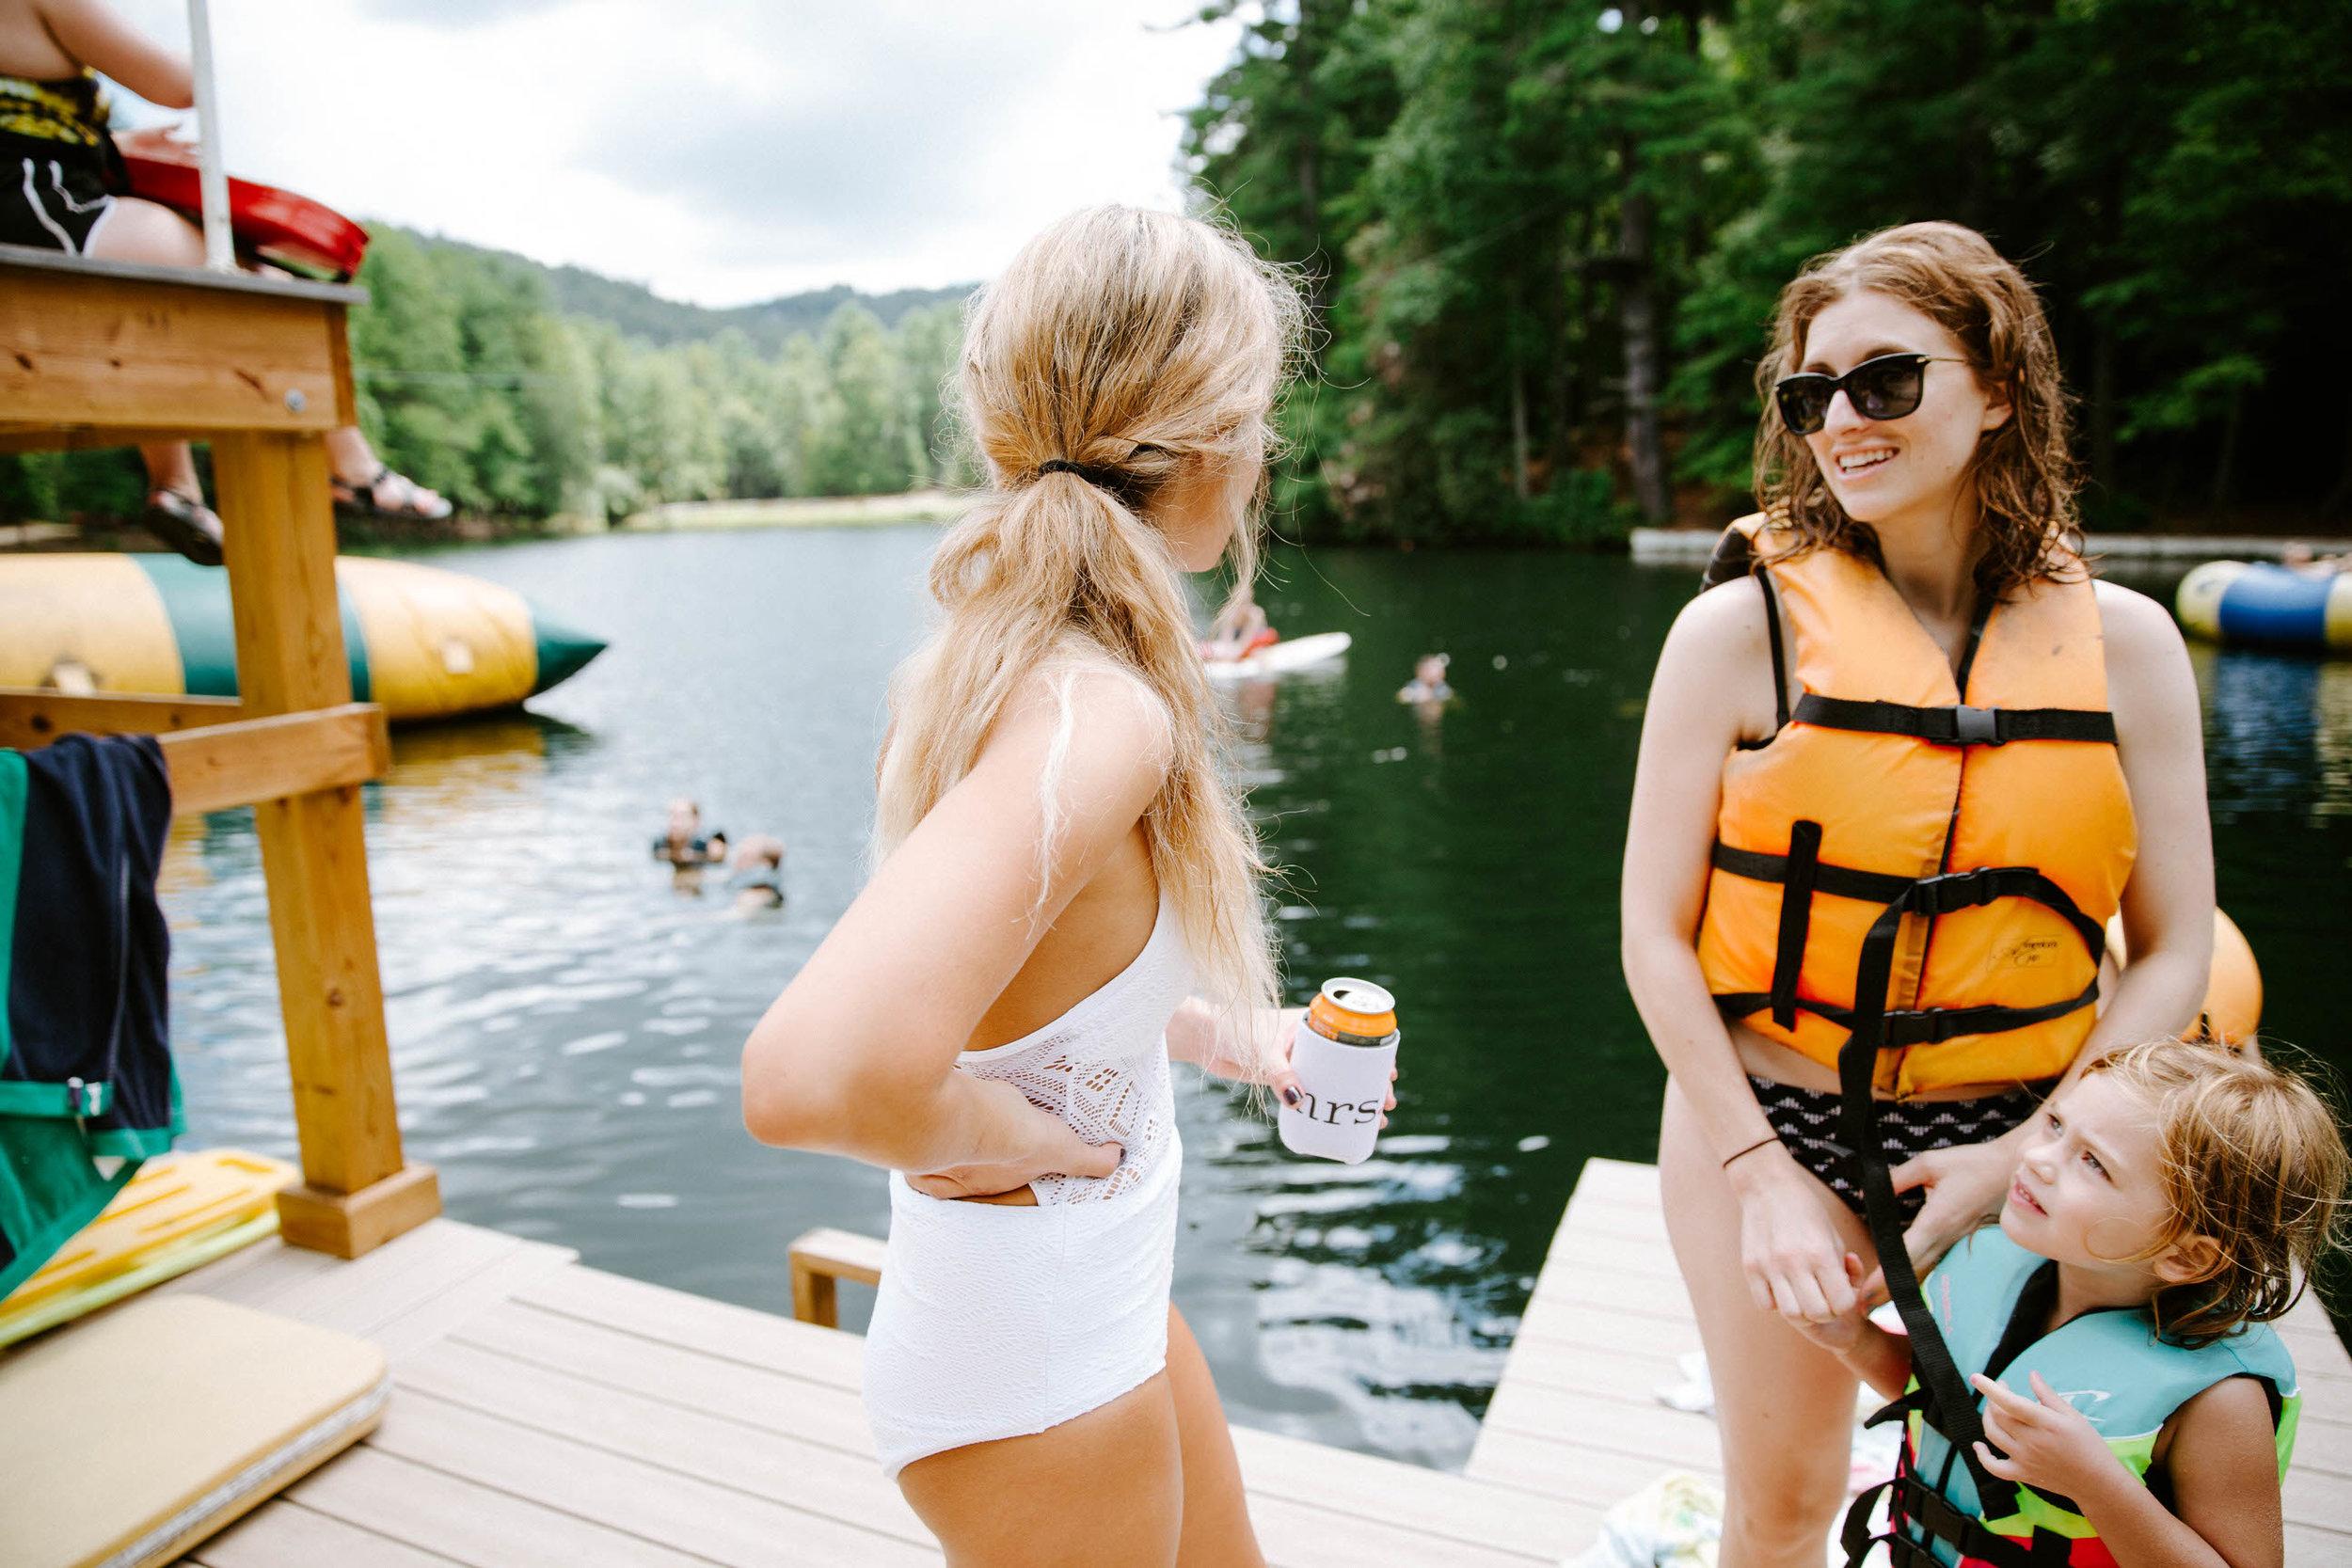 jeremy+elle-Lake-0706.jpg